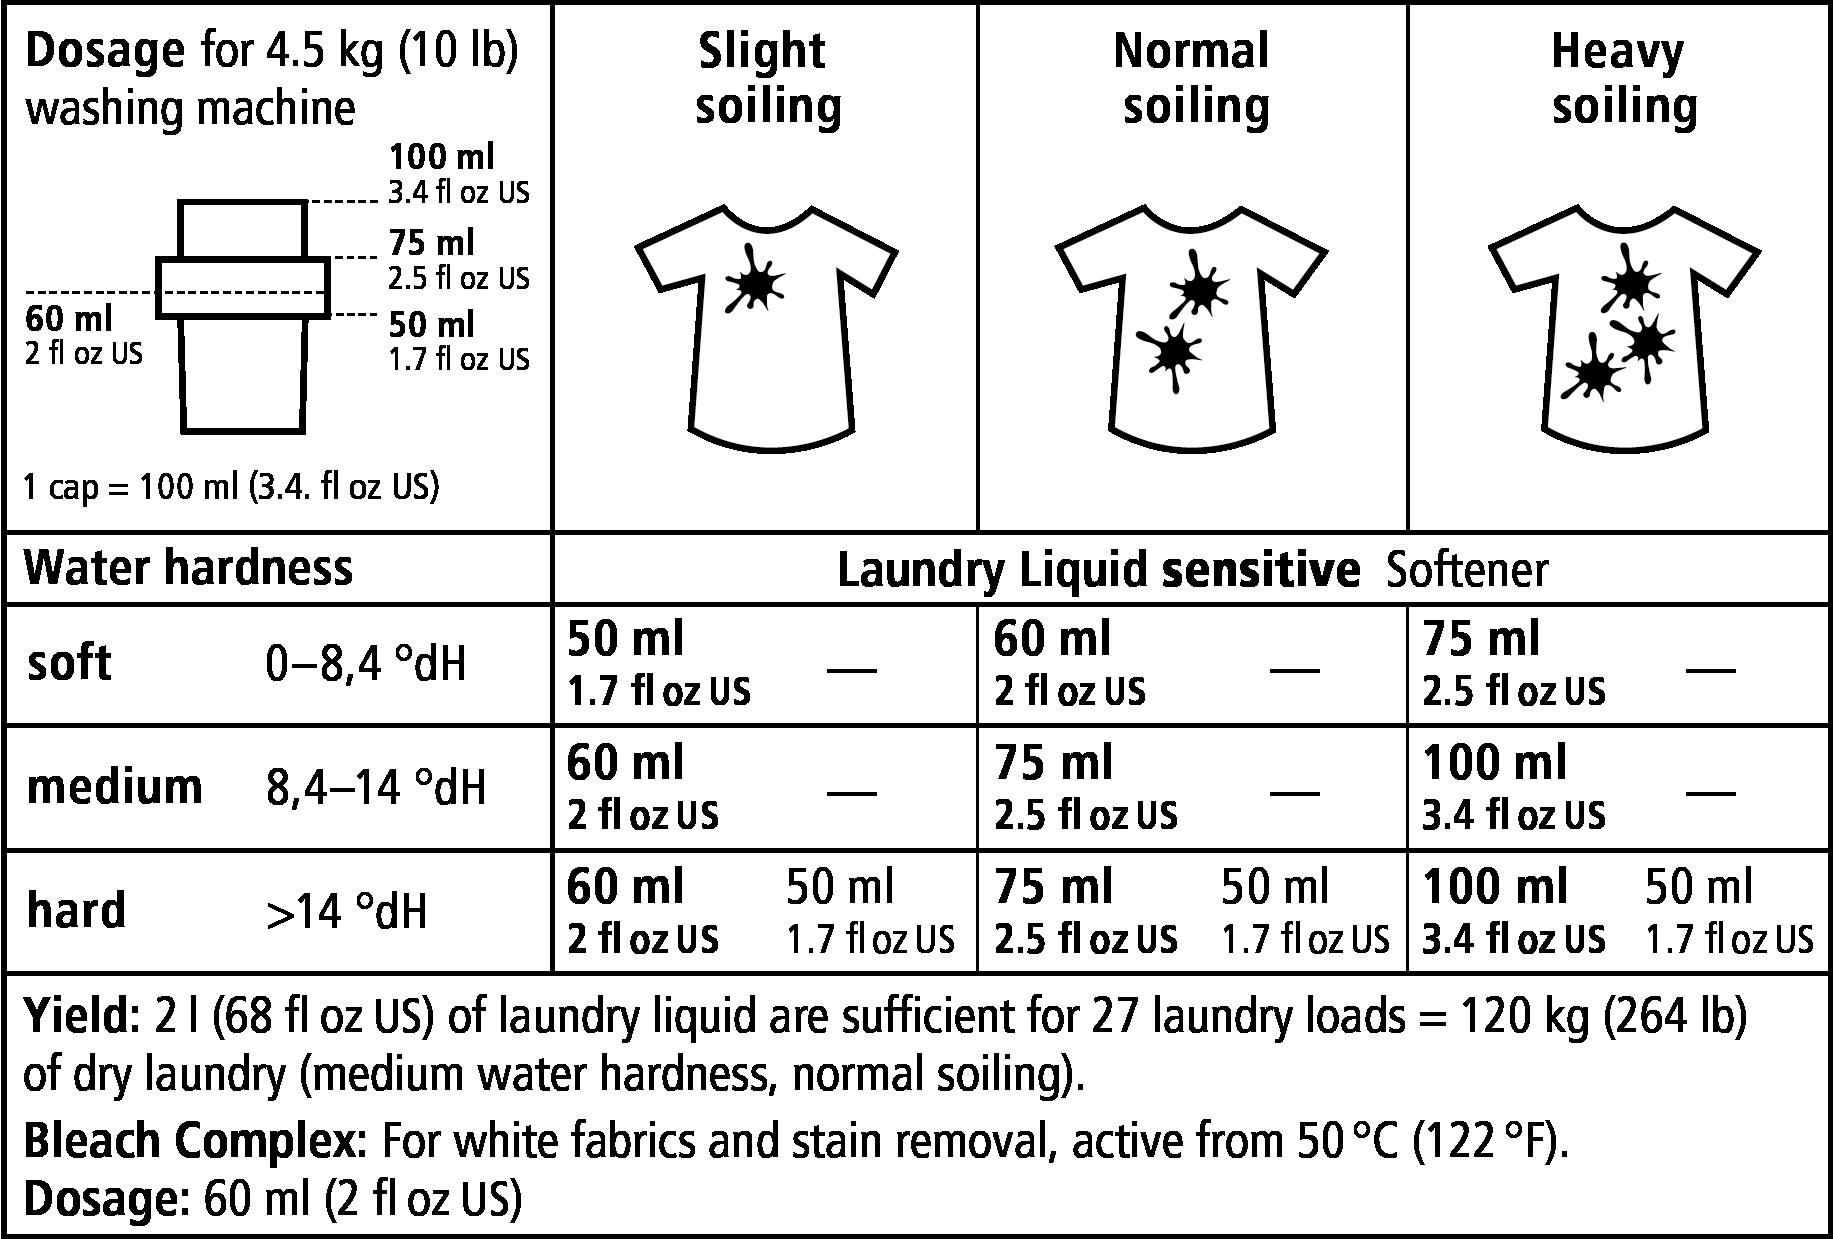 sonett_dosage_laundry_liquid_sensitive.png